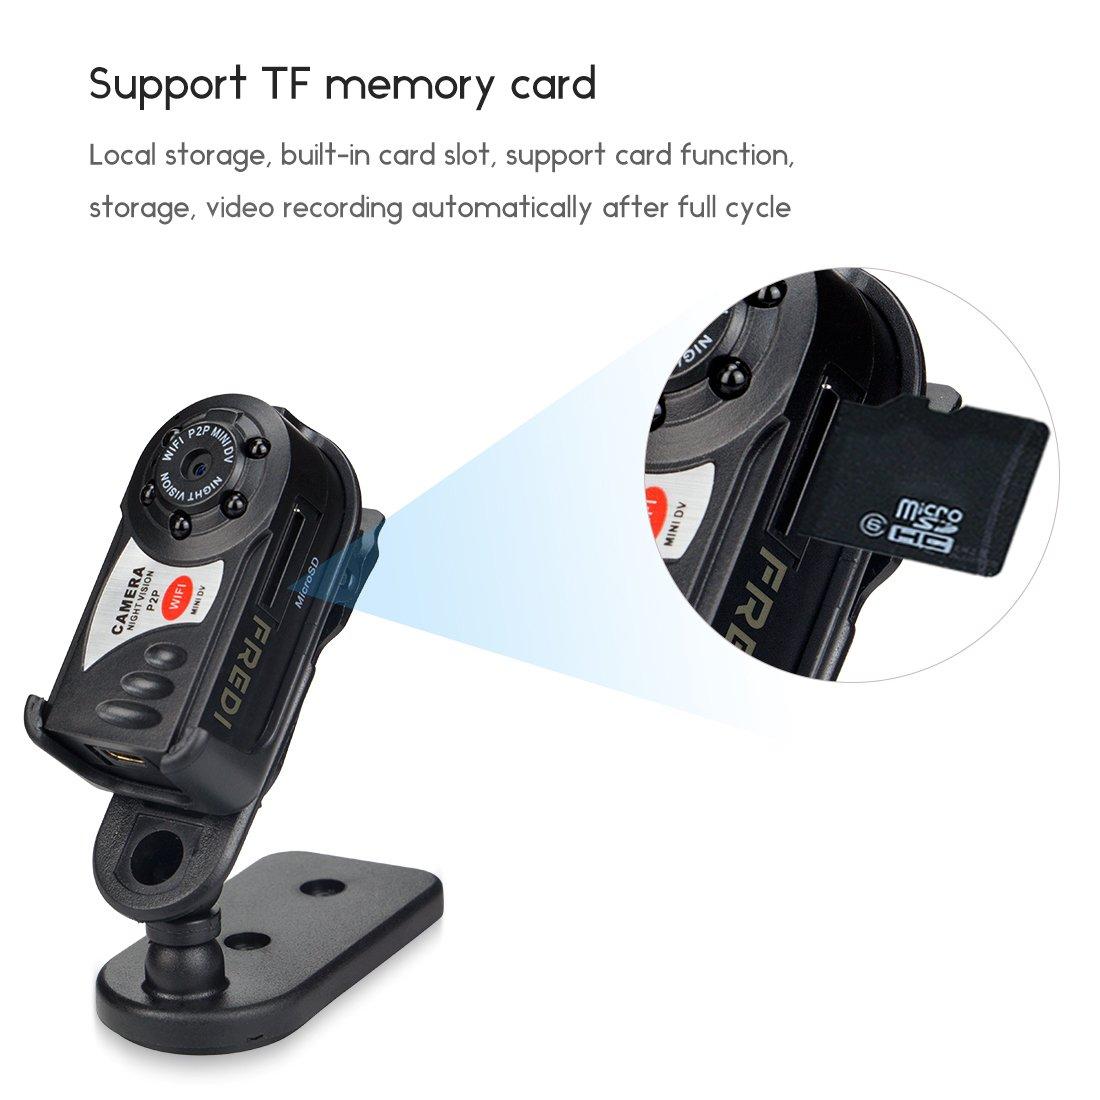 galleon fredi mini portable p2p wifi ip camera indoor outdoor hd dv hidden spy camera video. Black Bedroom Furniture Sets. Home Design Ideas